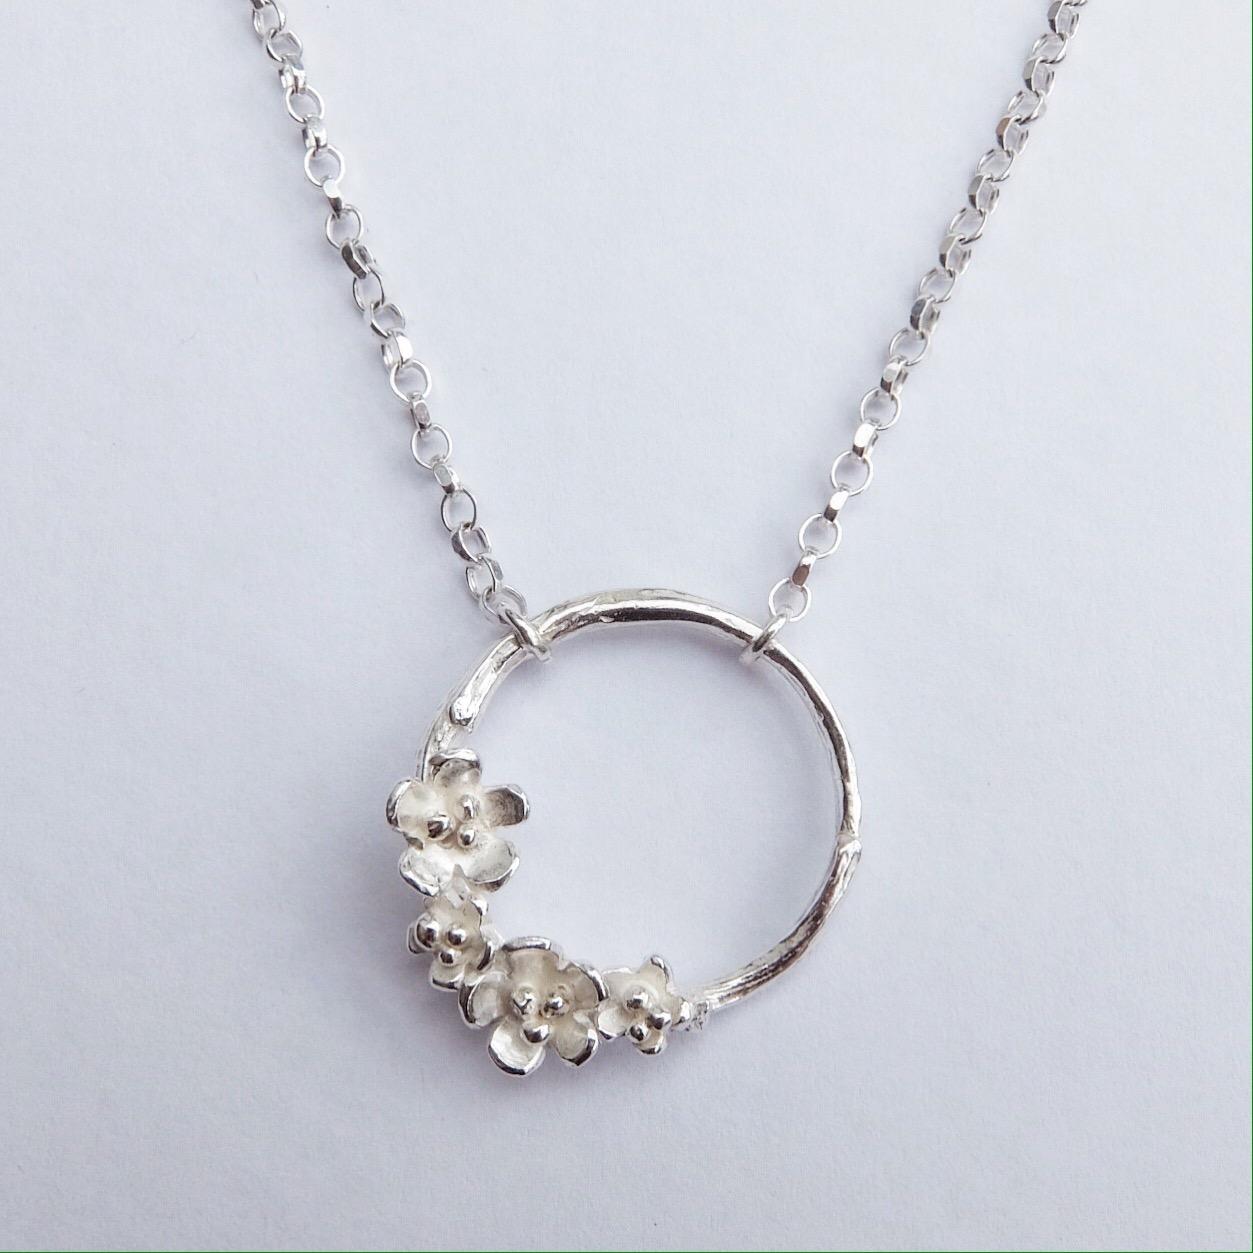 flower and twig circle silver pendant handmade uk devon jeweller jasmine bowden apple blossom necklace.jpg